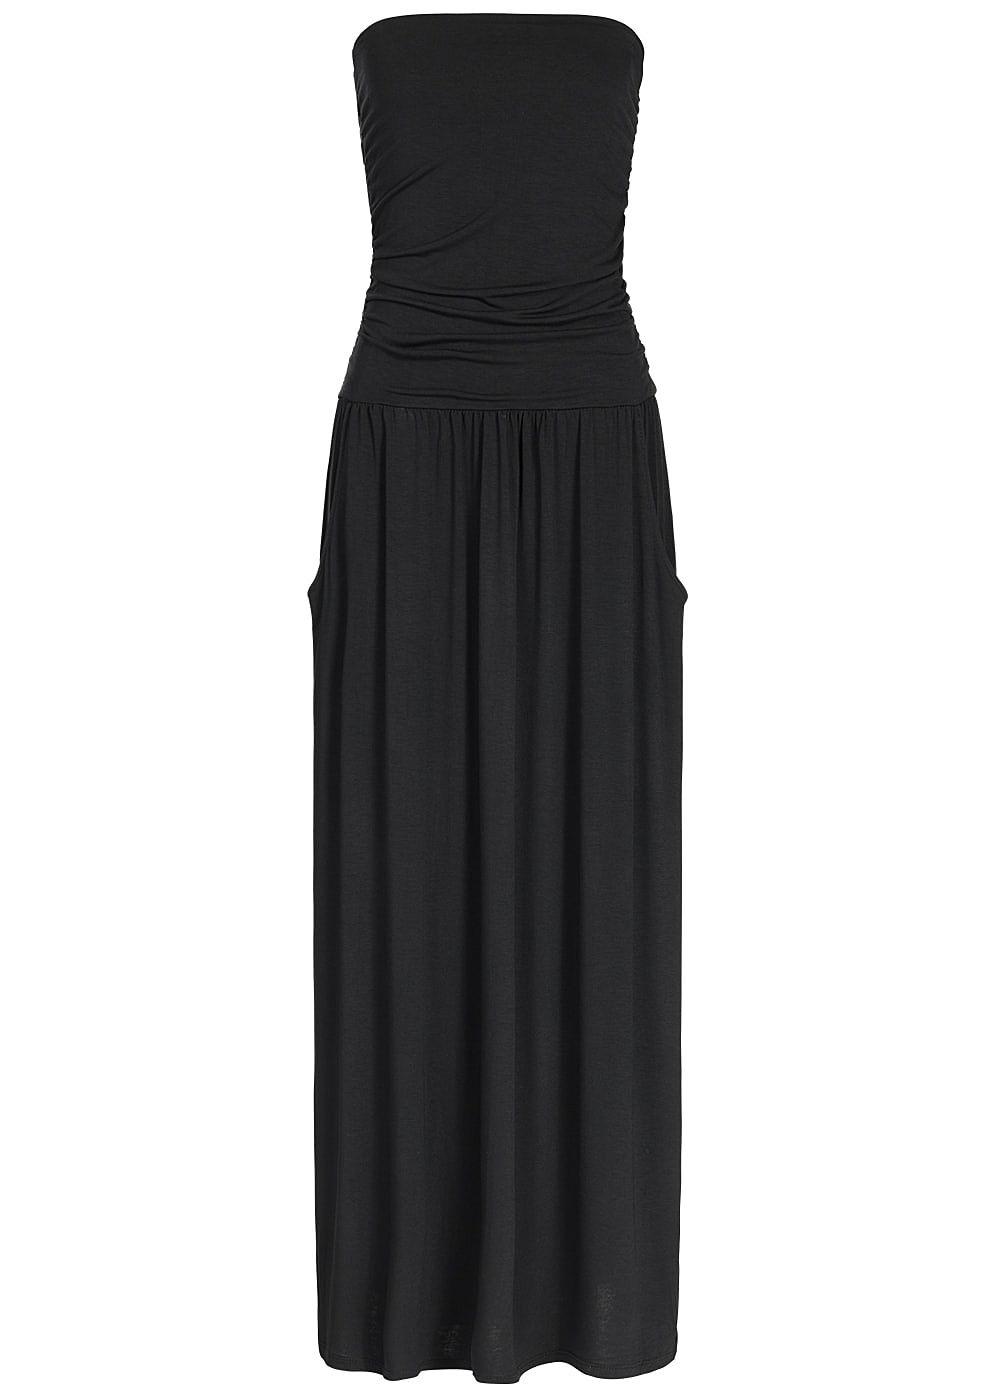 styleboom fashion bandeau longform kleid 2 taschen vorne kn chellang schwarz 77onlineshop. Black Bedroom Furniture Sets. Home Design Ideas